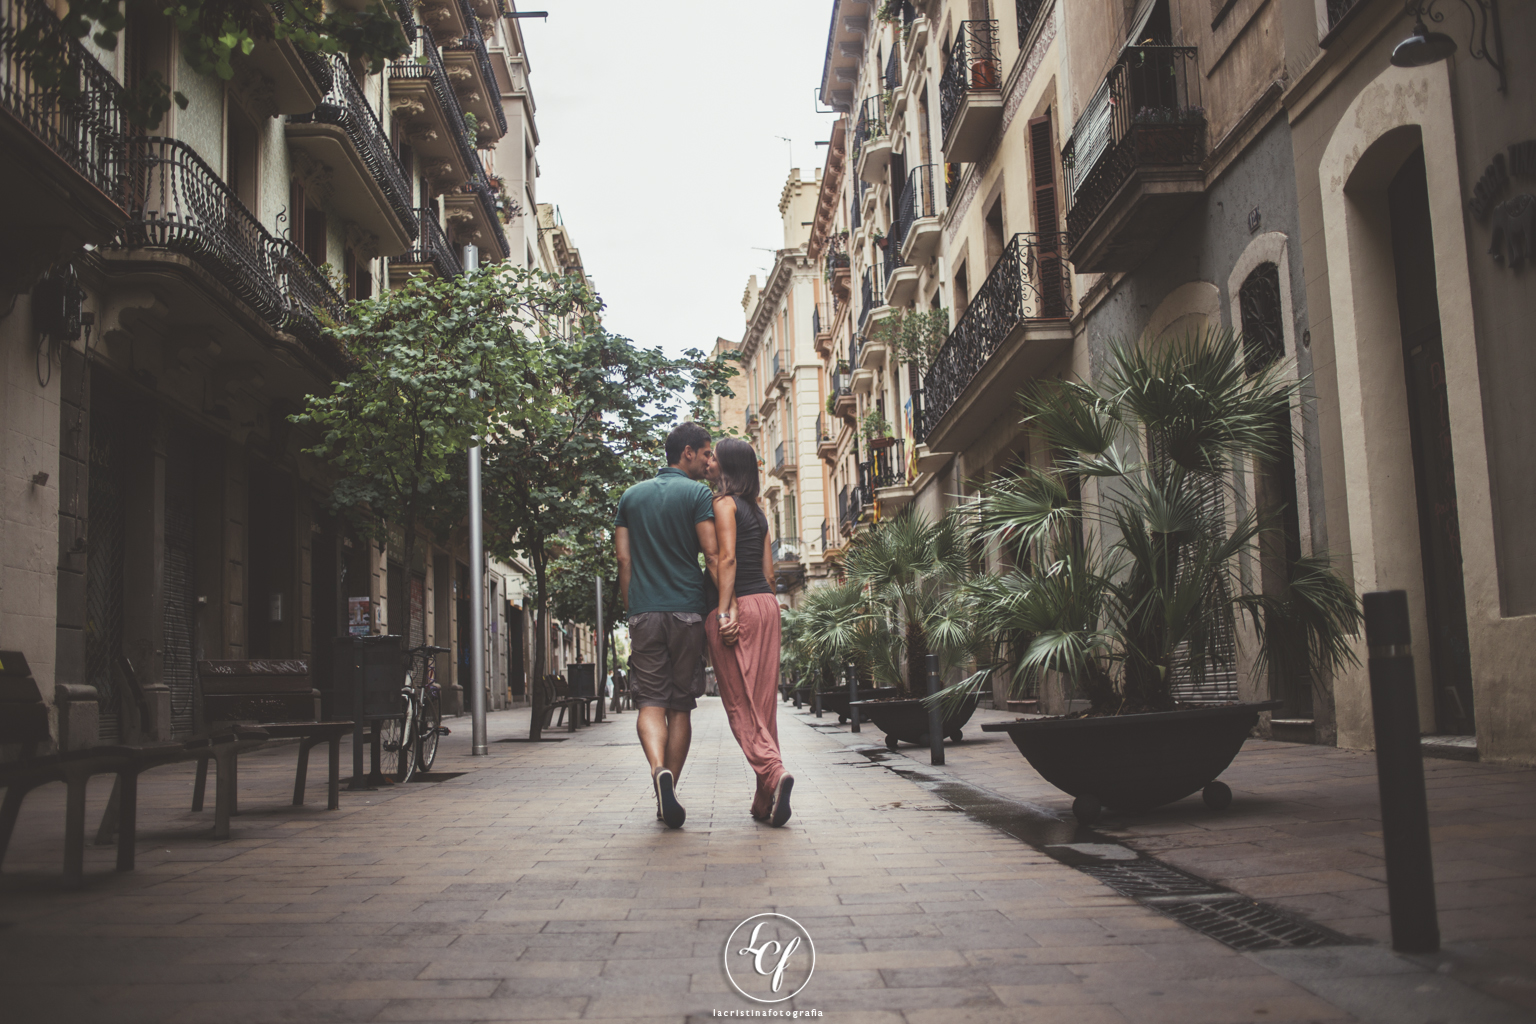 fotografo_embarazo_barcelona_embarazada-1